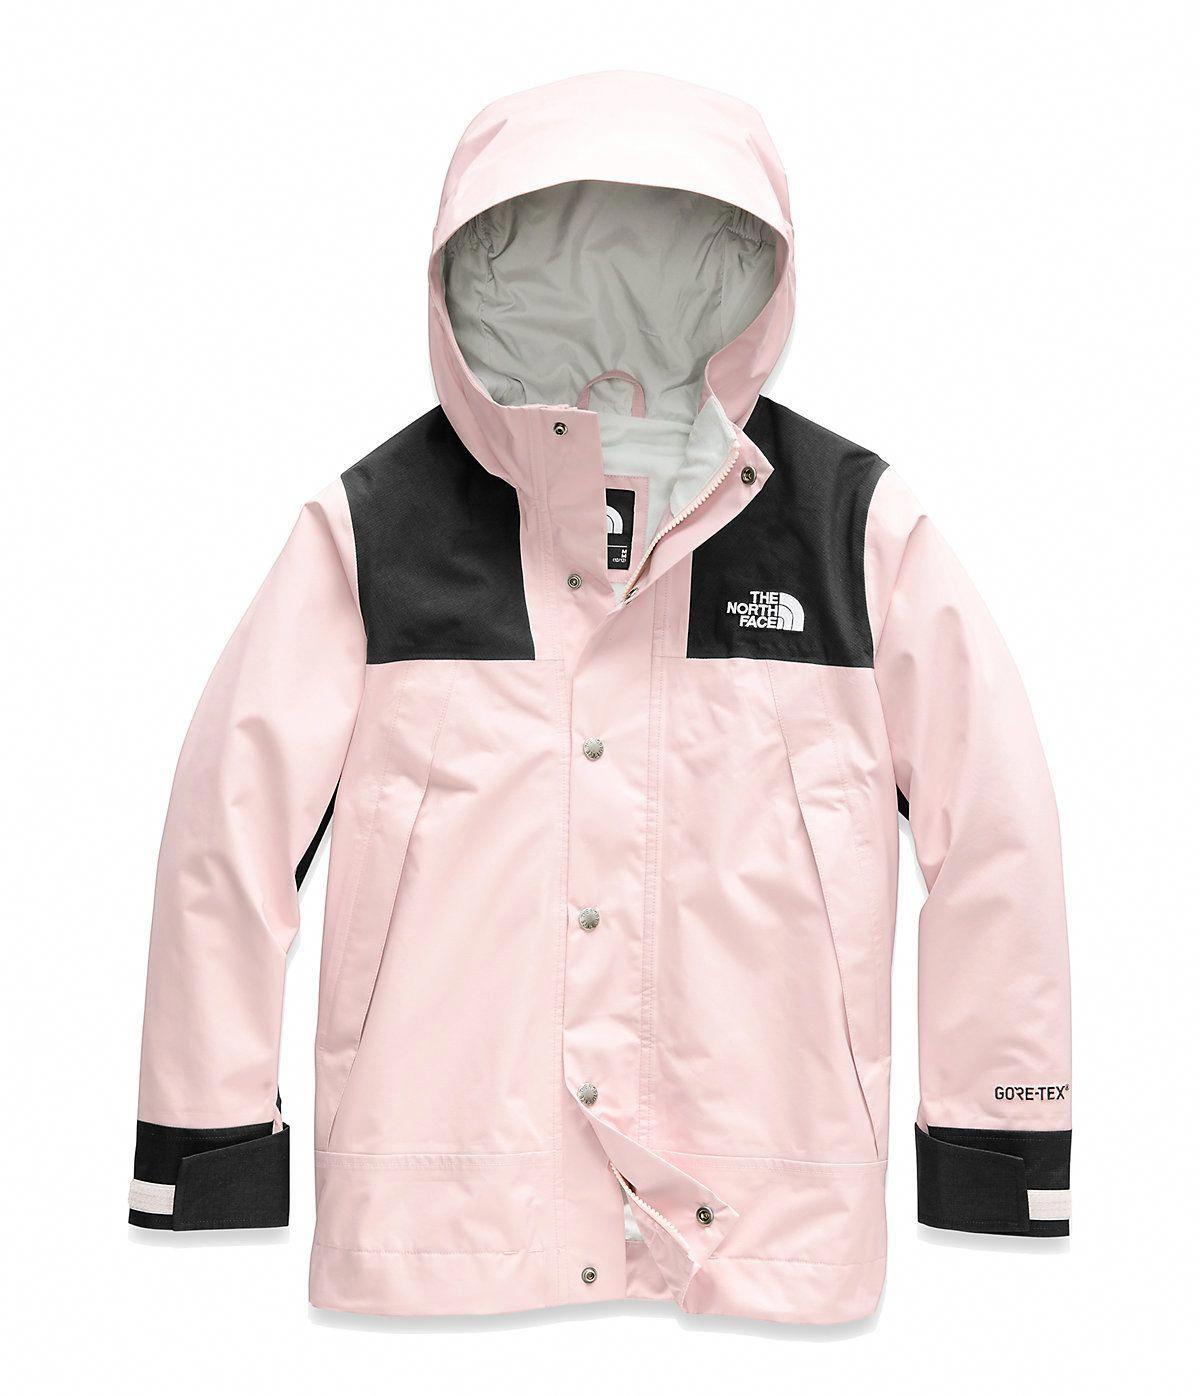 Inexpensive Rain Jacket Womens Raincoatsforwomenred Info 4945064313 Northfacerainjacketwomens North Face Jacket Winter Jacket North Face Rain Jackets Outfit [ 1396 x 1200 Pixel ]